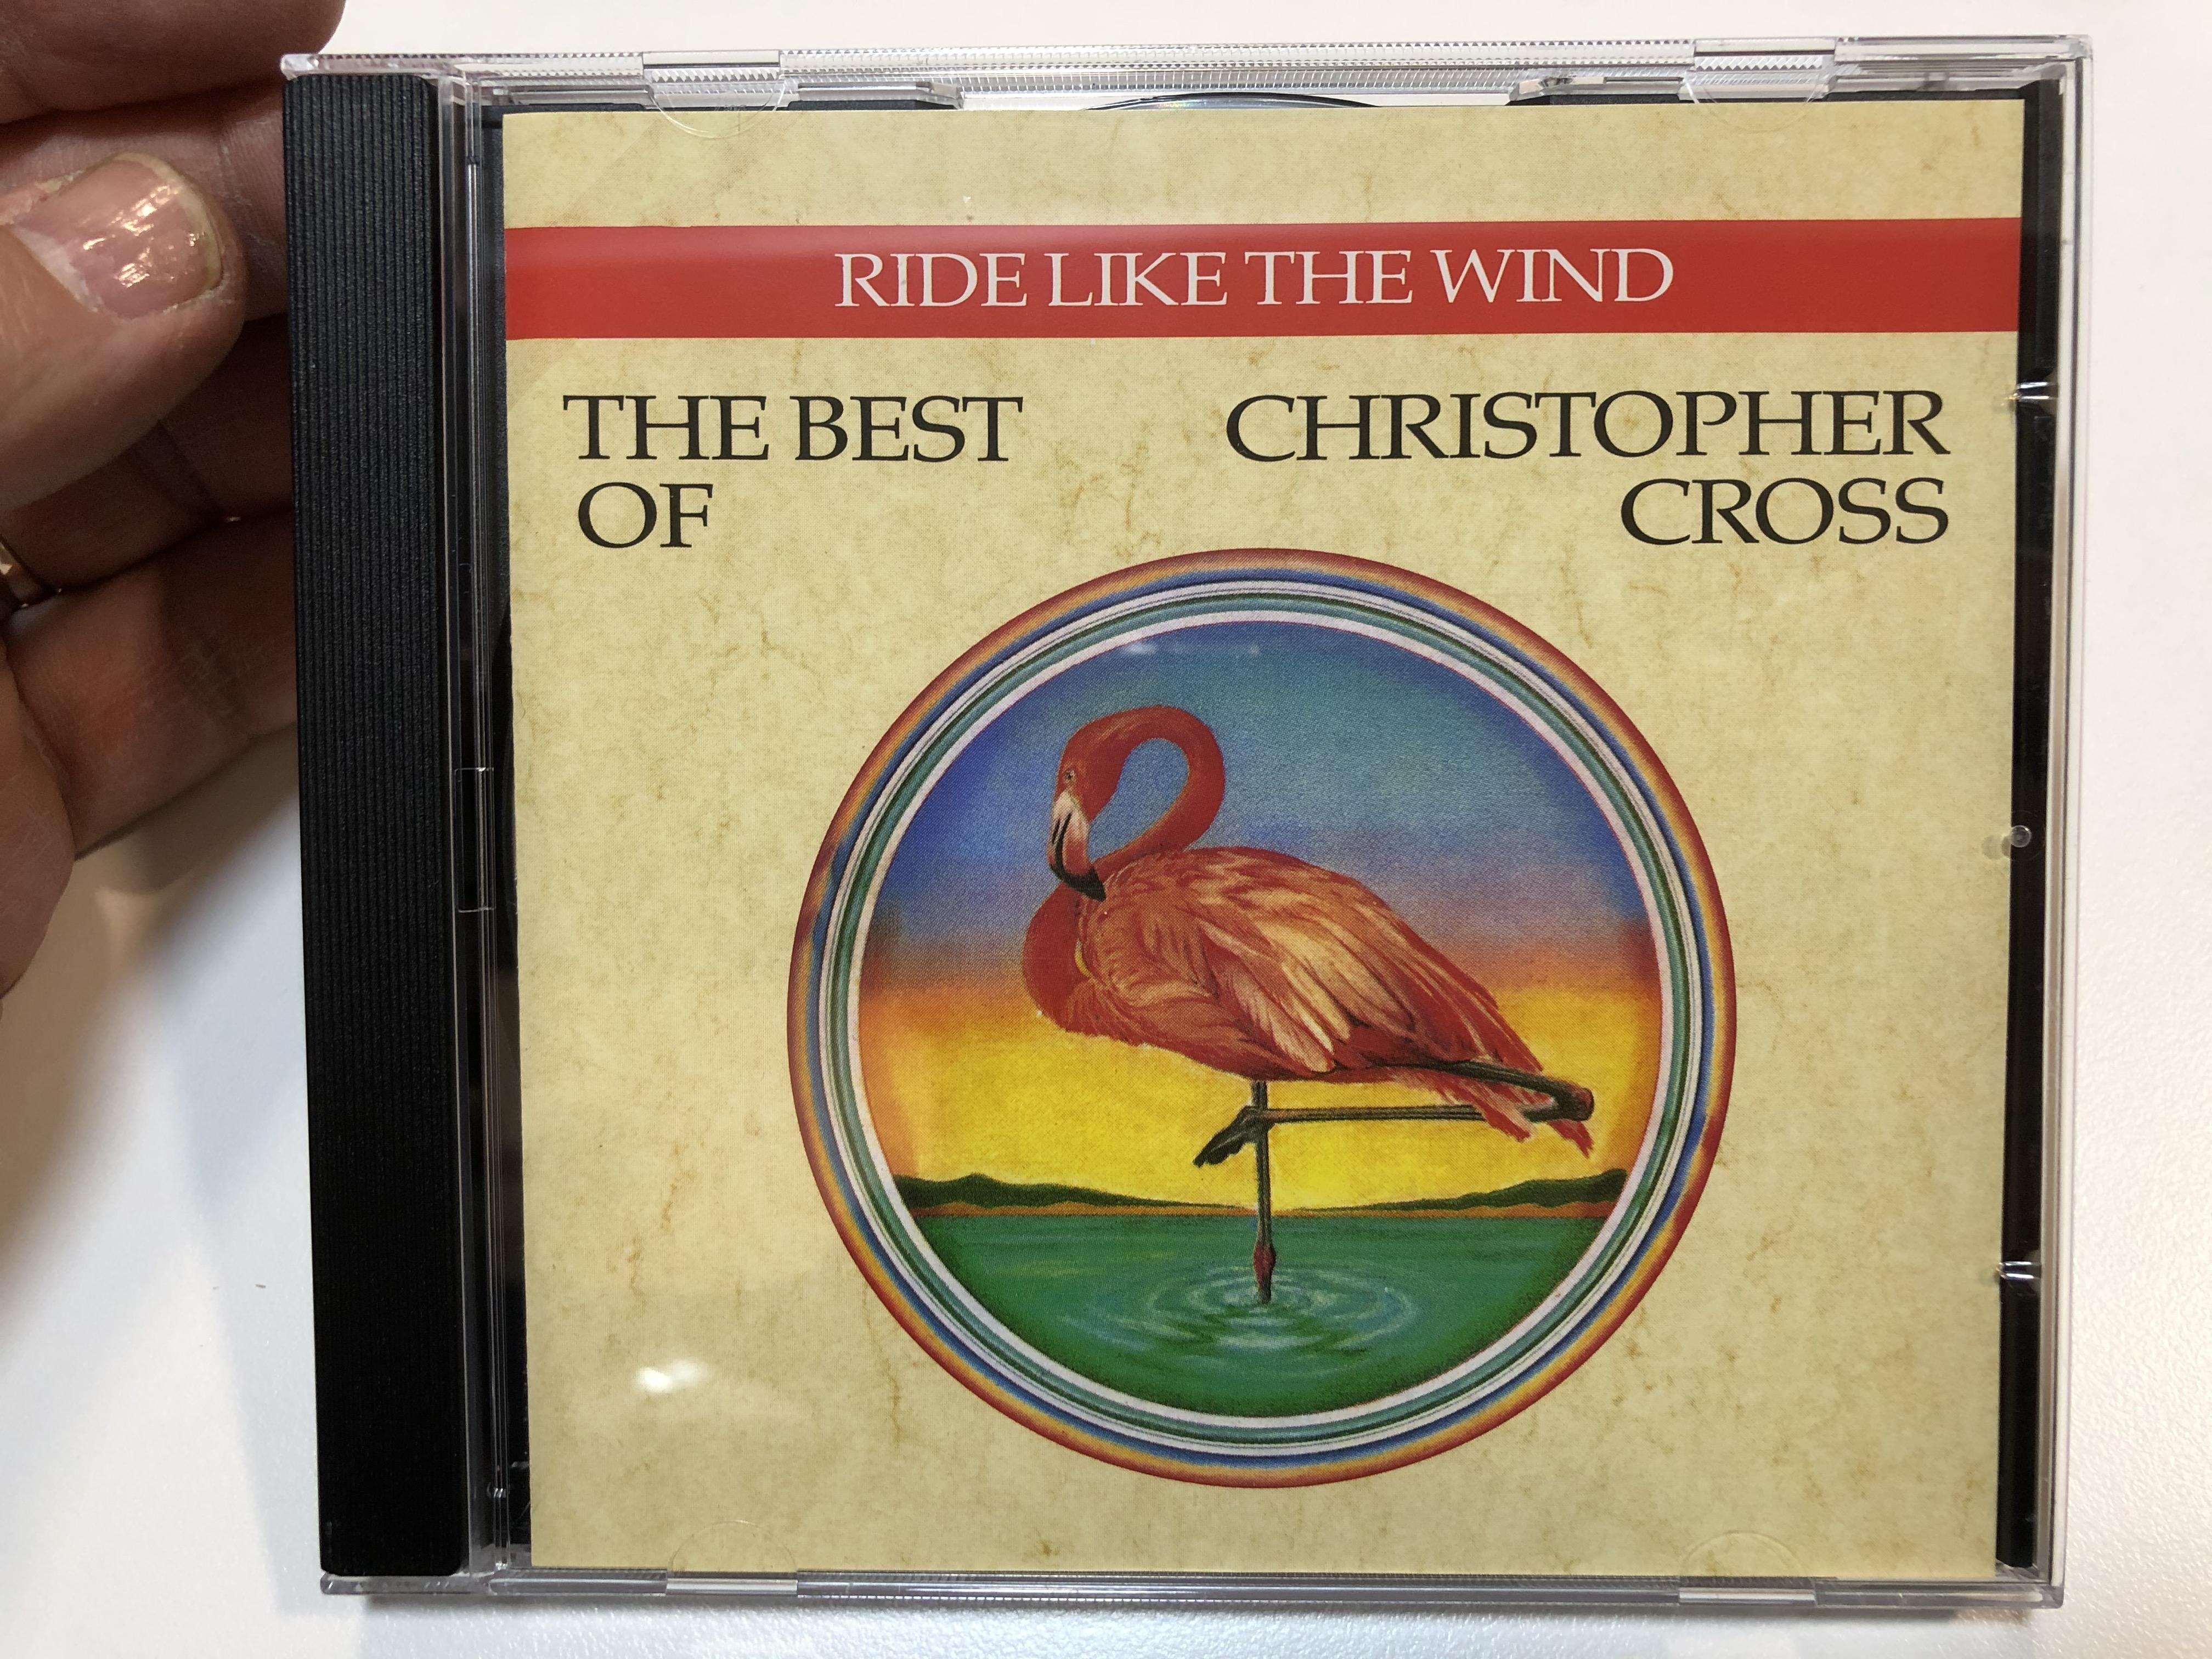 ride-like-the-wind-the-best-of-christopher-cross-warner-bros.-records-audio-cd-1992-9548-30656-2-1-.jpg